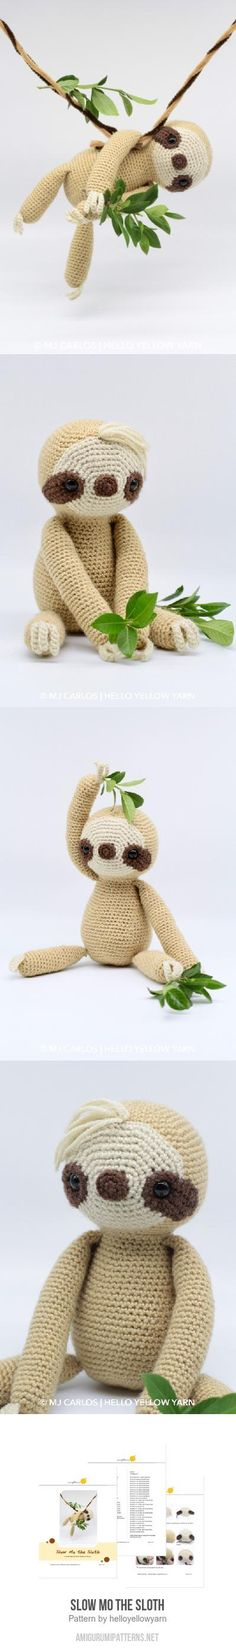 Slow Mo the Sloth amigurumi pattern